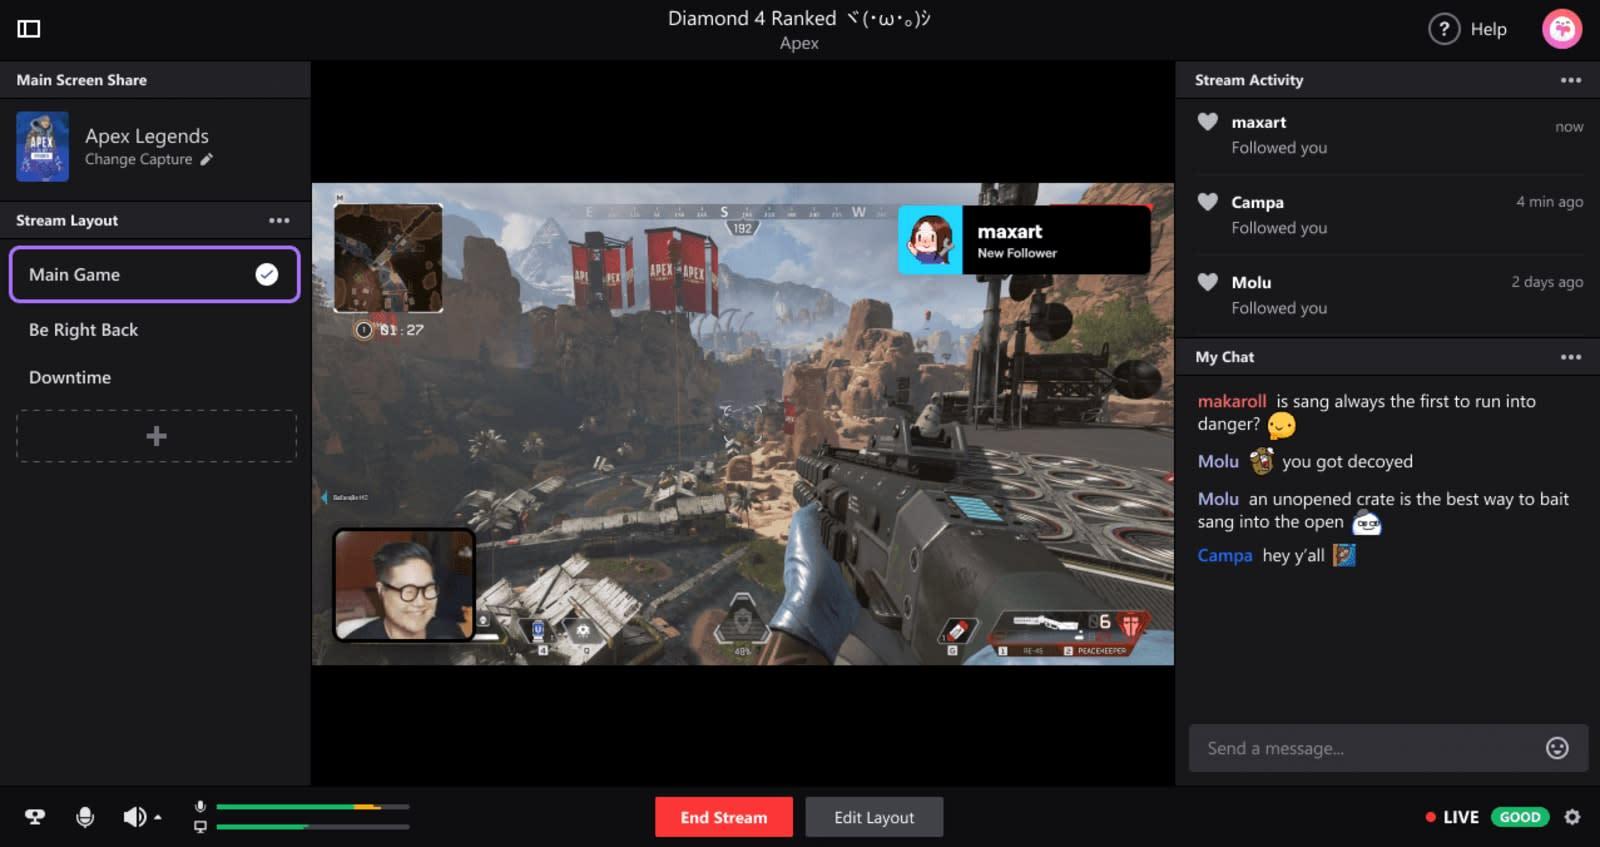 Twitch unveils its own desktop broadcasting app